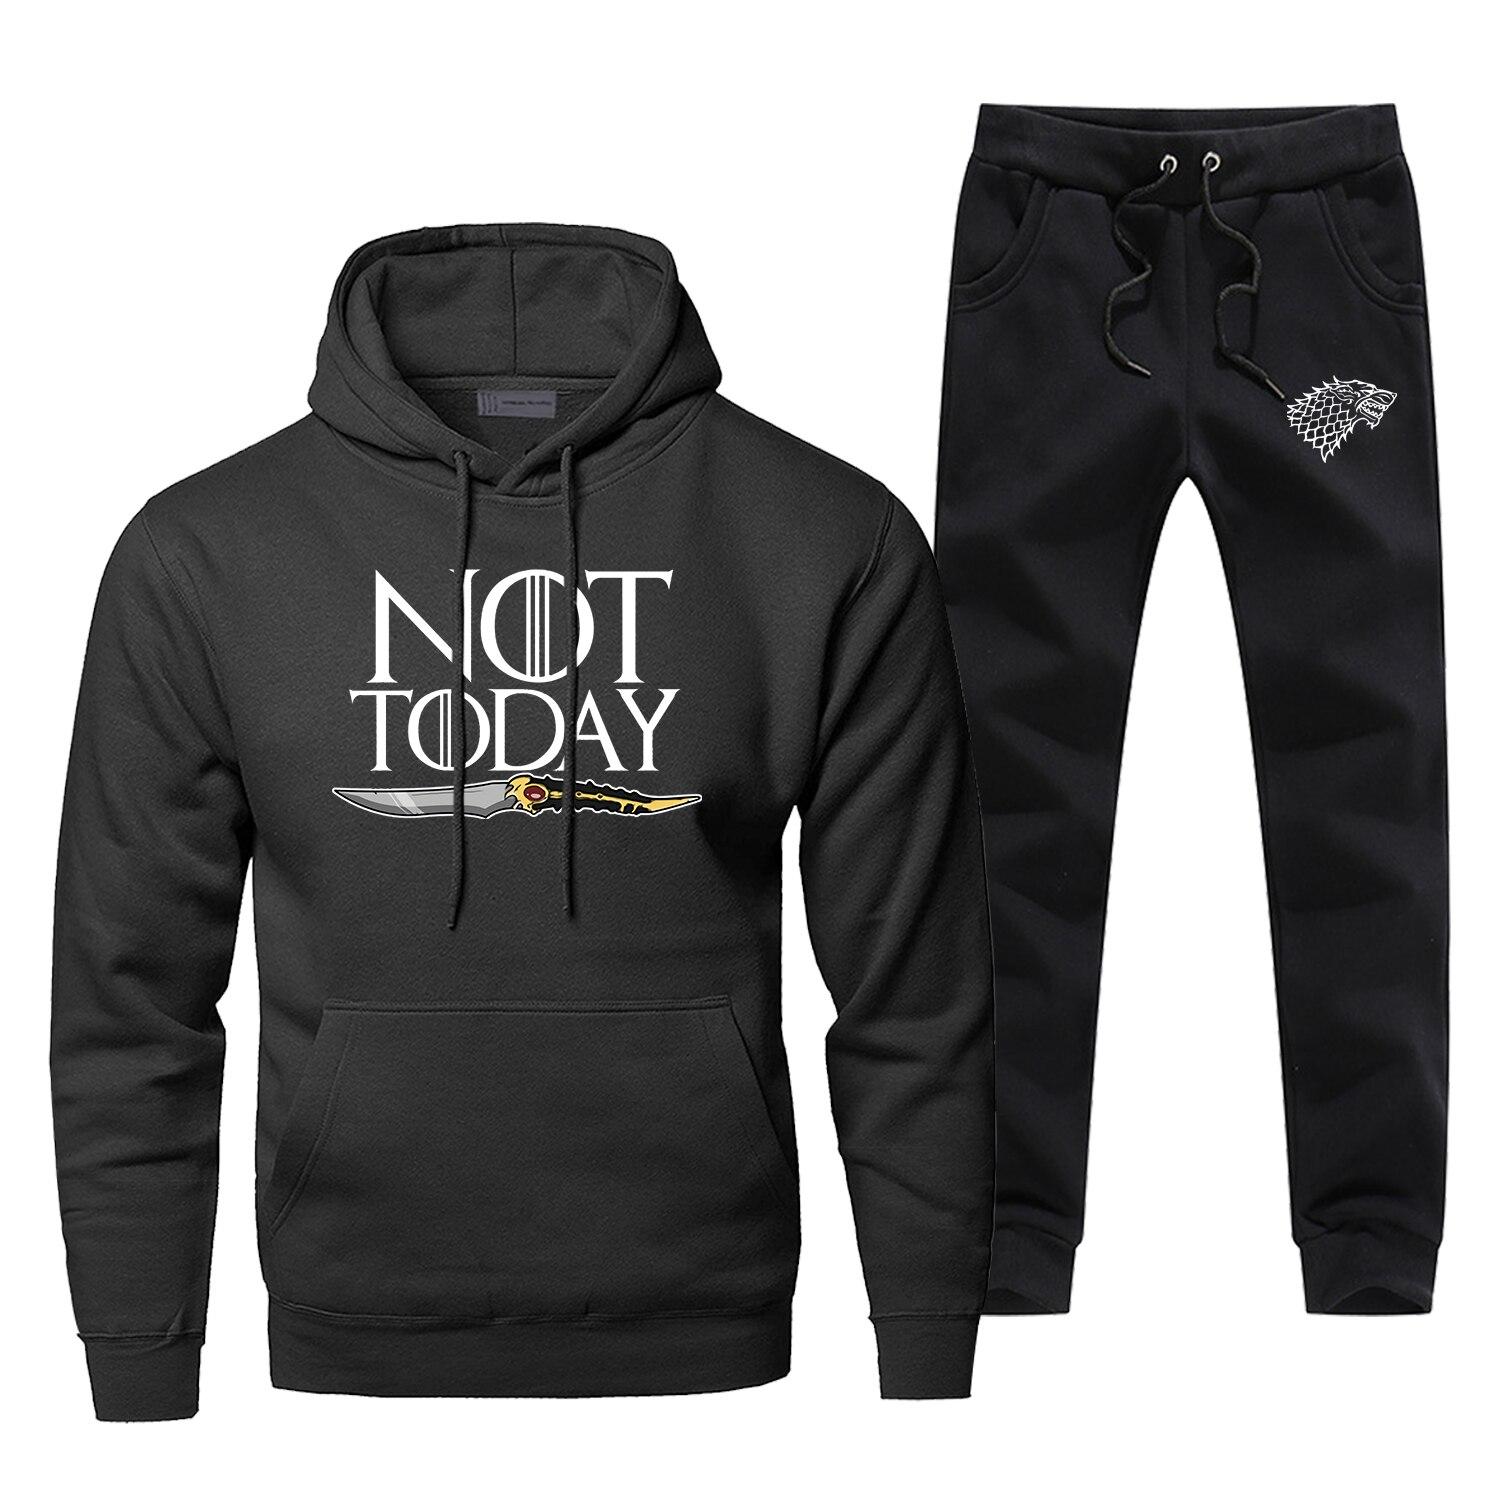 Game Of Thrones Hoodies Pants Suit Men Sets Ayra House Stark Sweatshirt Sweatpants Sportswear Autumn 2 PCS Not Today Tracksuit